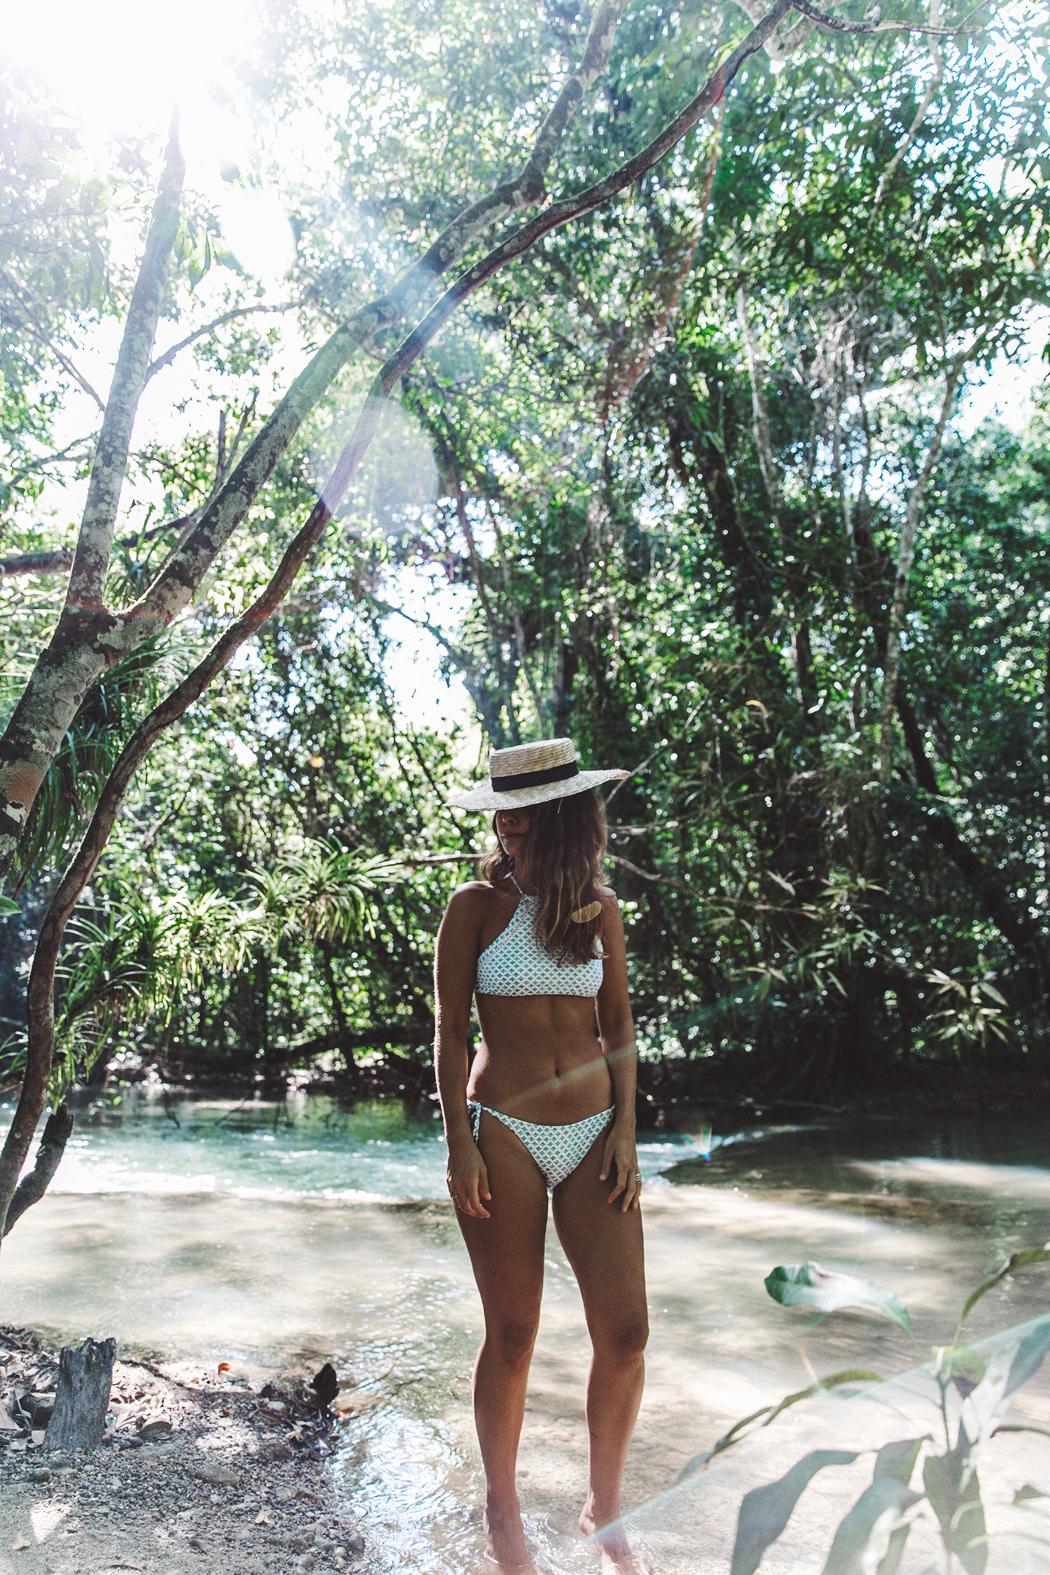 YS_FALLS-Jamaica-Peony_Swimwear-Lack_Of_Colors_Hat-Straw_Hat-Swimwear_Bikini-Outfit-1